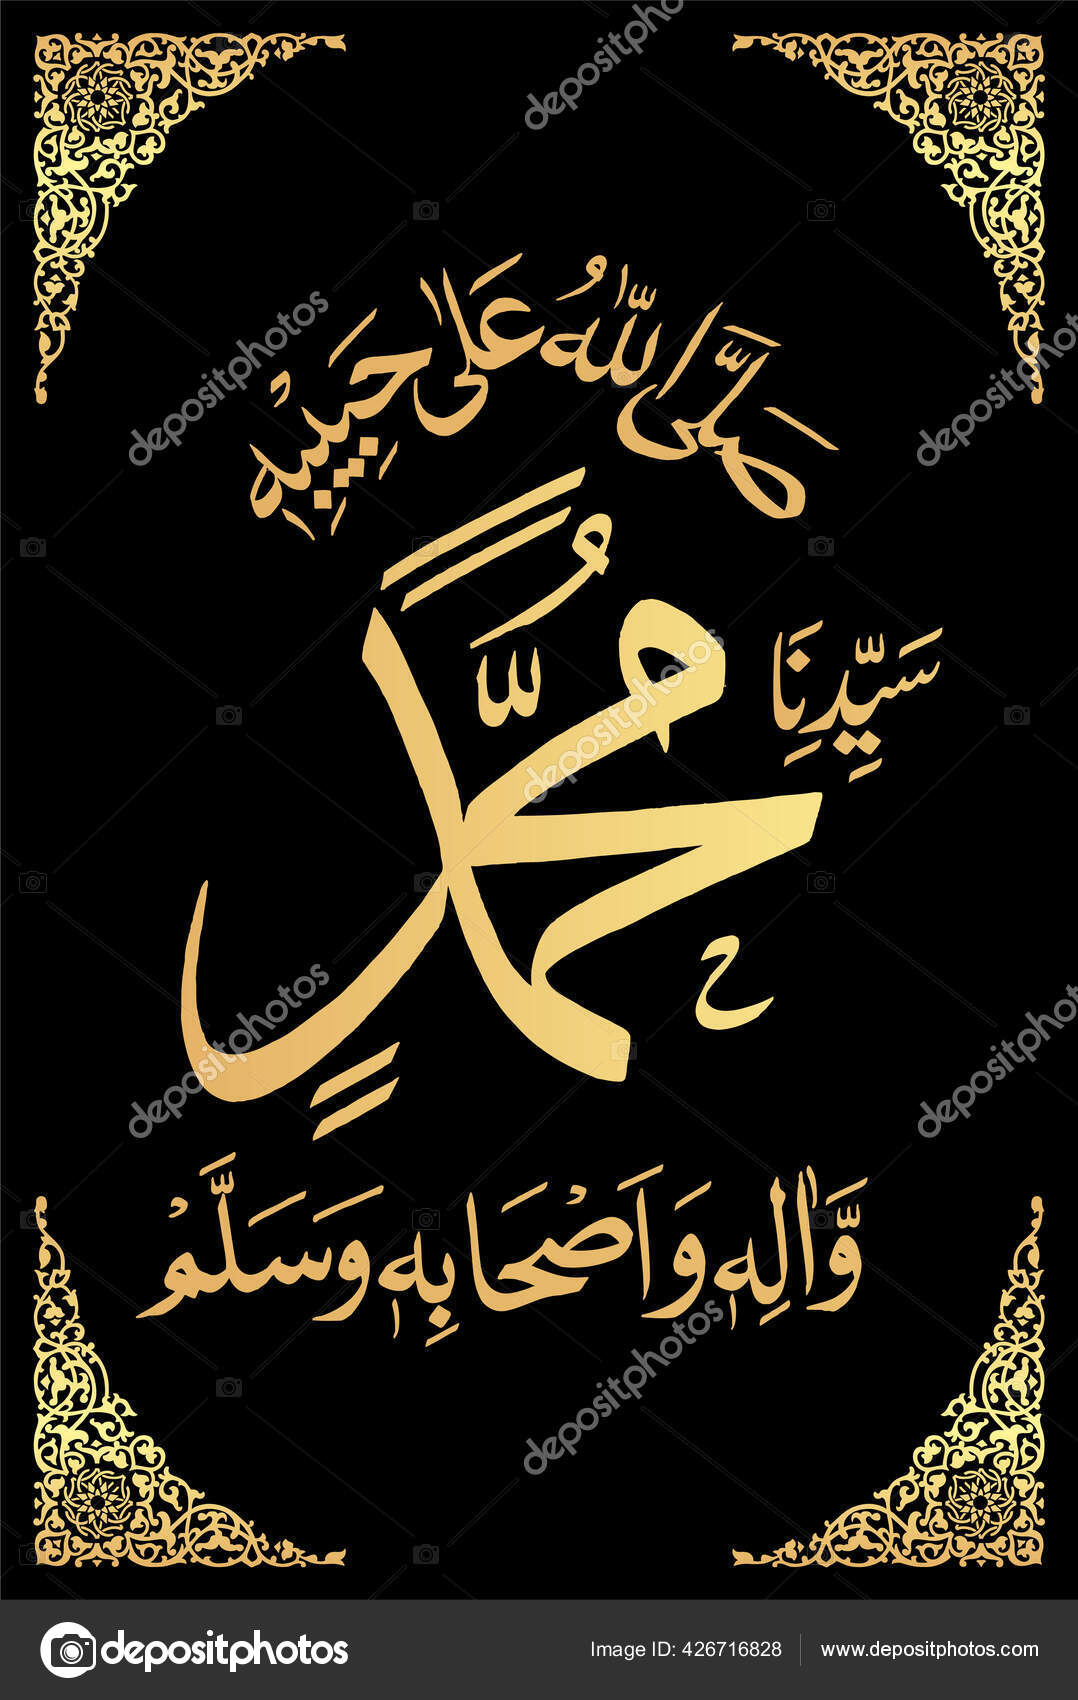 Tulisan Muhammad Arab : tulisan, muhammad, Kaligrafi, Durud, Durood, Sharif, Semoga, Allah, Memberkati, Muhammad, Vektor, Muhammadimran98.hotmail.com, #426716828